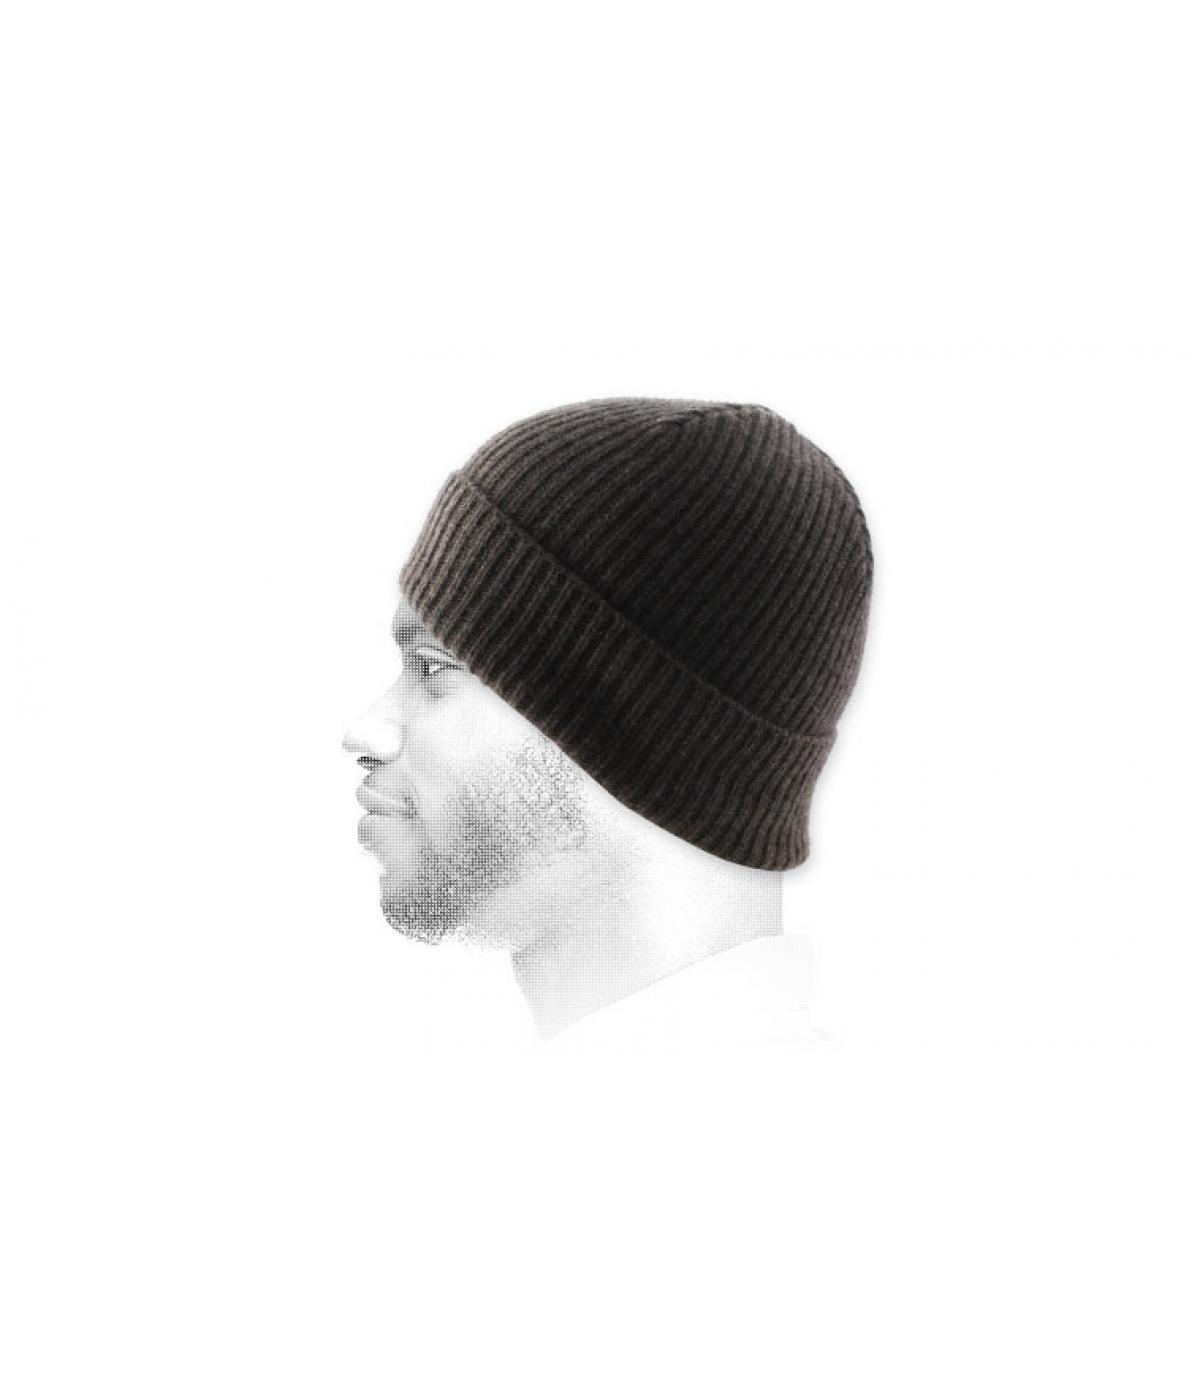 Braune Mütze Revers Wolle Angora